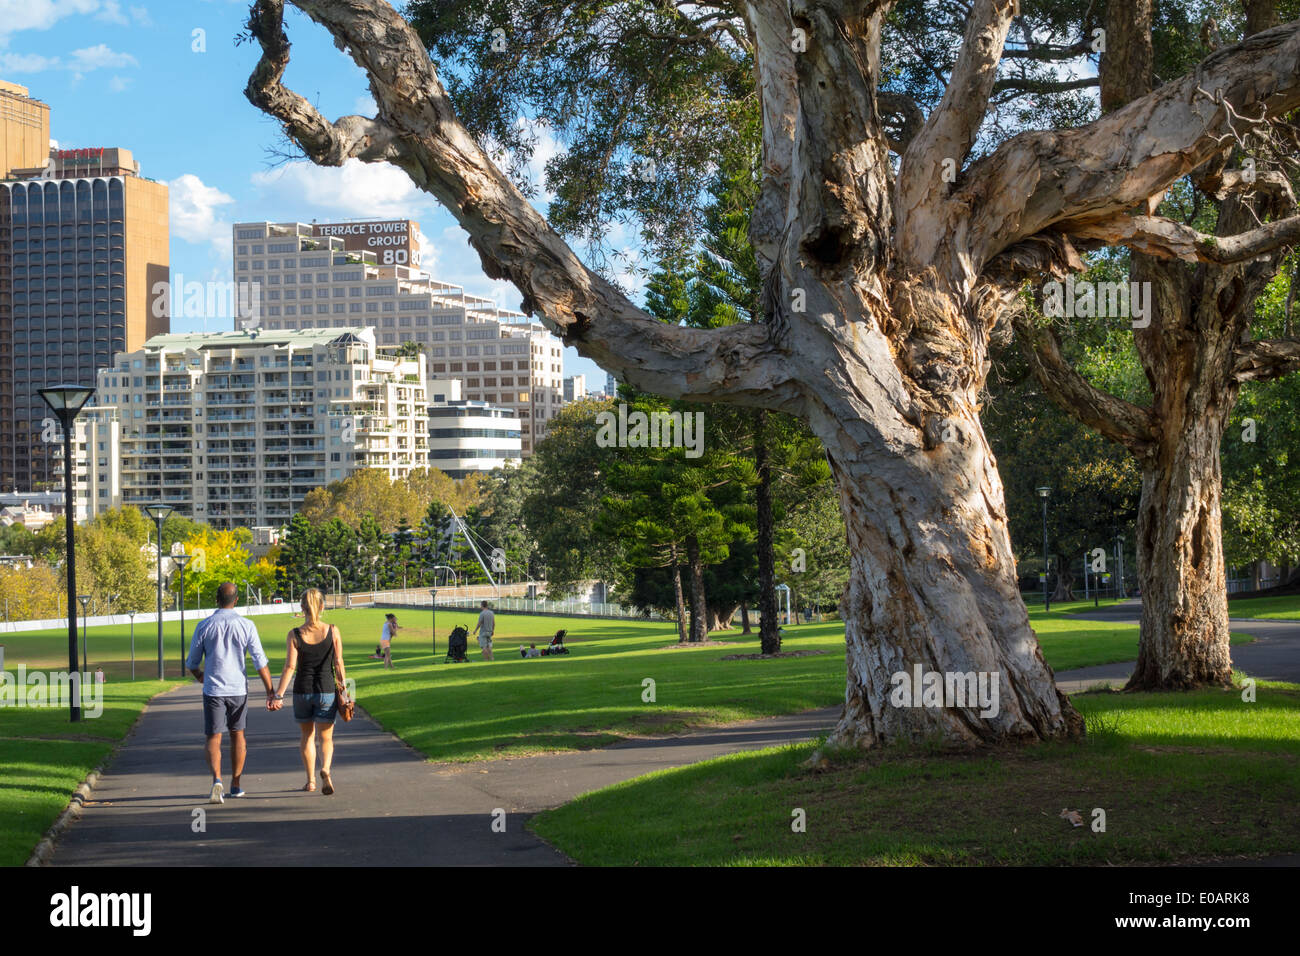 sydney australia nsw new south wales royal botanic gardens. Black Bedroom Furniture Sets. Home Design Ideas